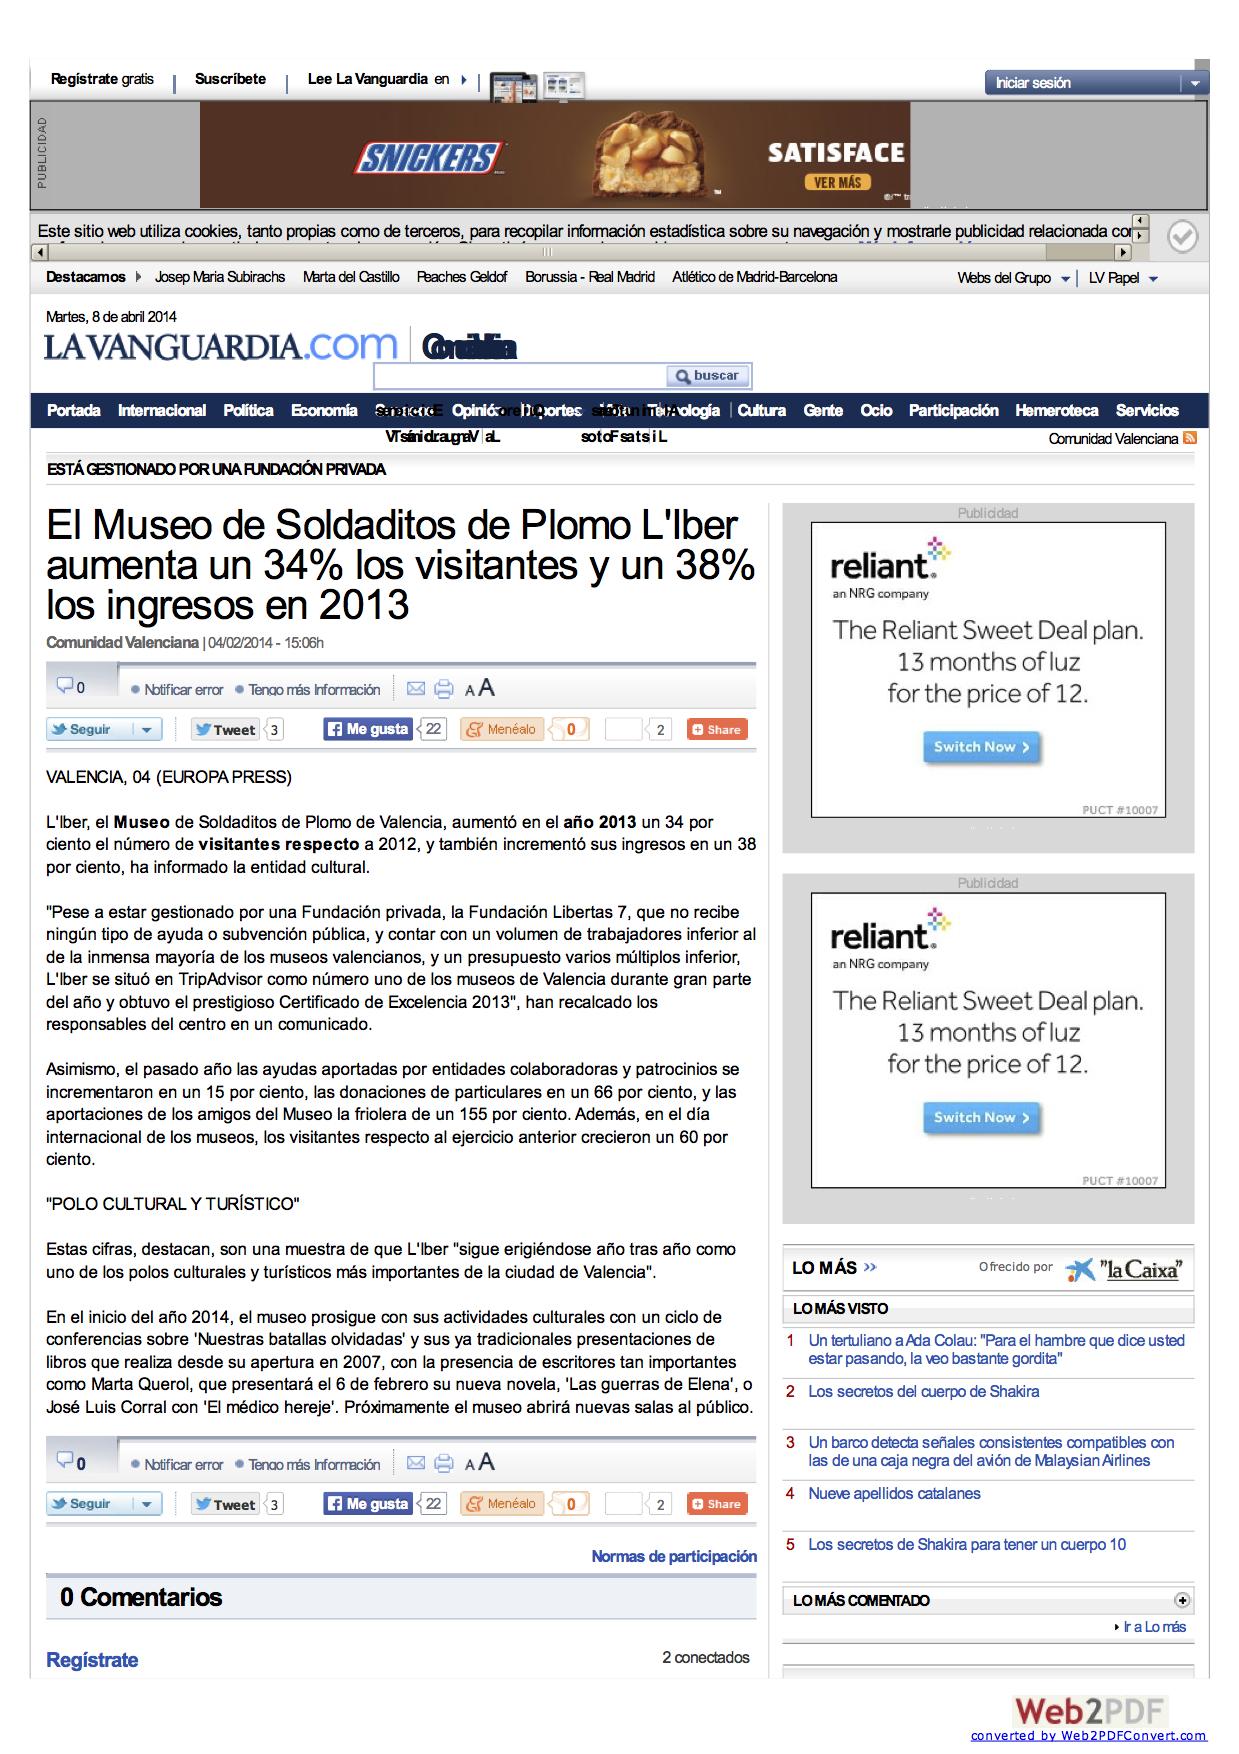 La Vanguardia Febrero 2014